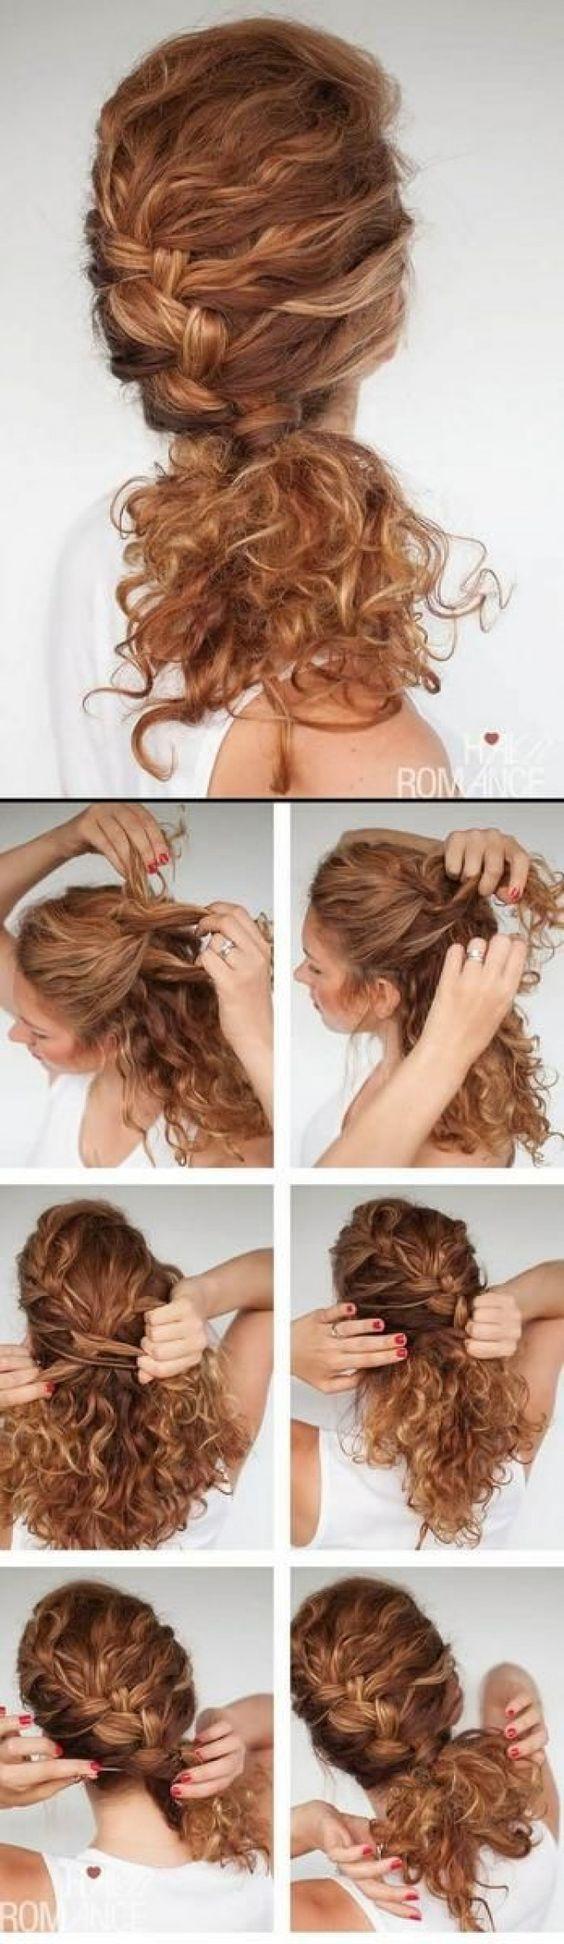 14penteados fantásticos para cabelos cacheados ecurtos: